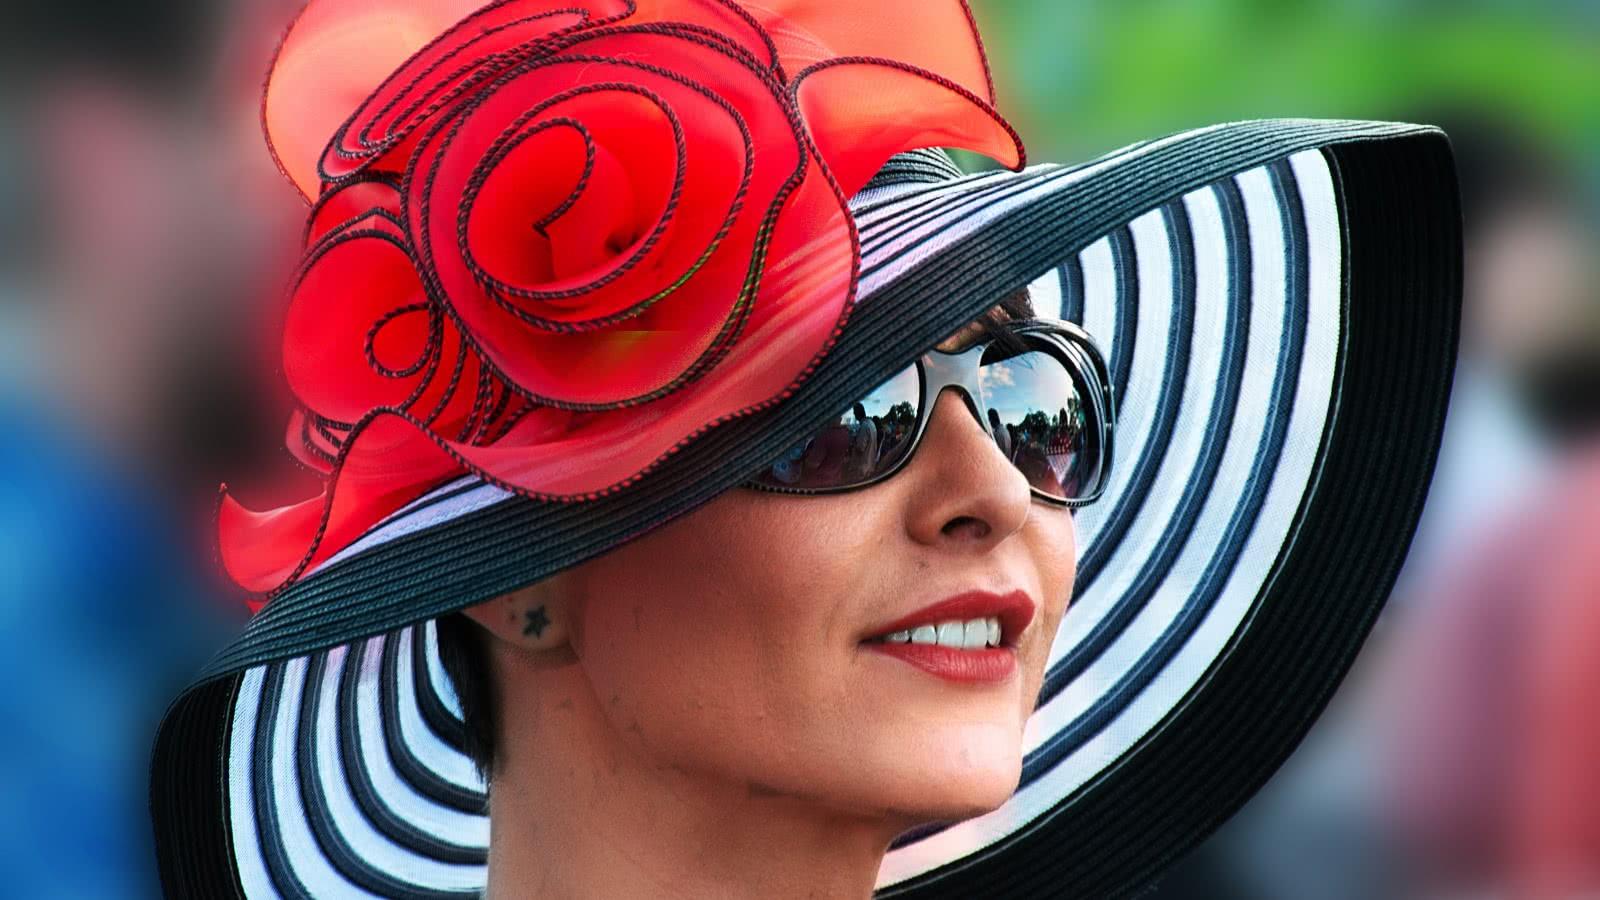 Chapeau ©HSVBOOTH-Pixabay